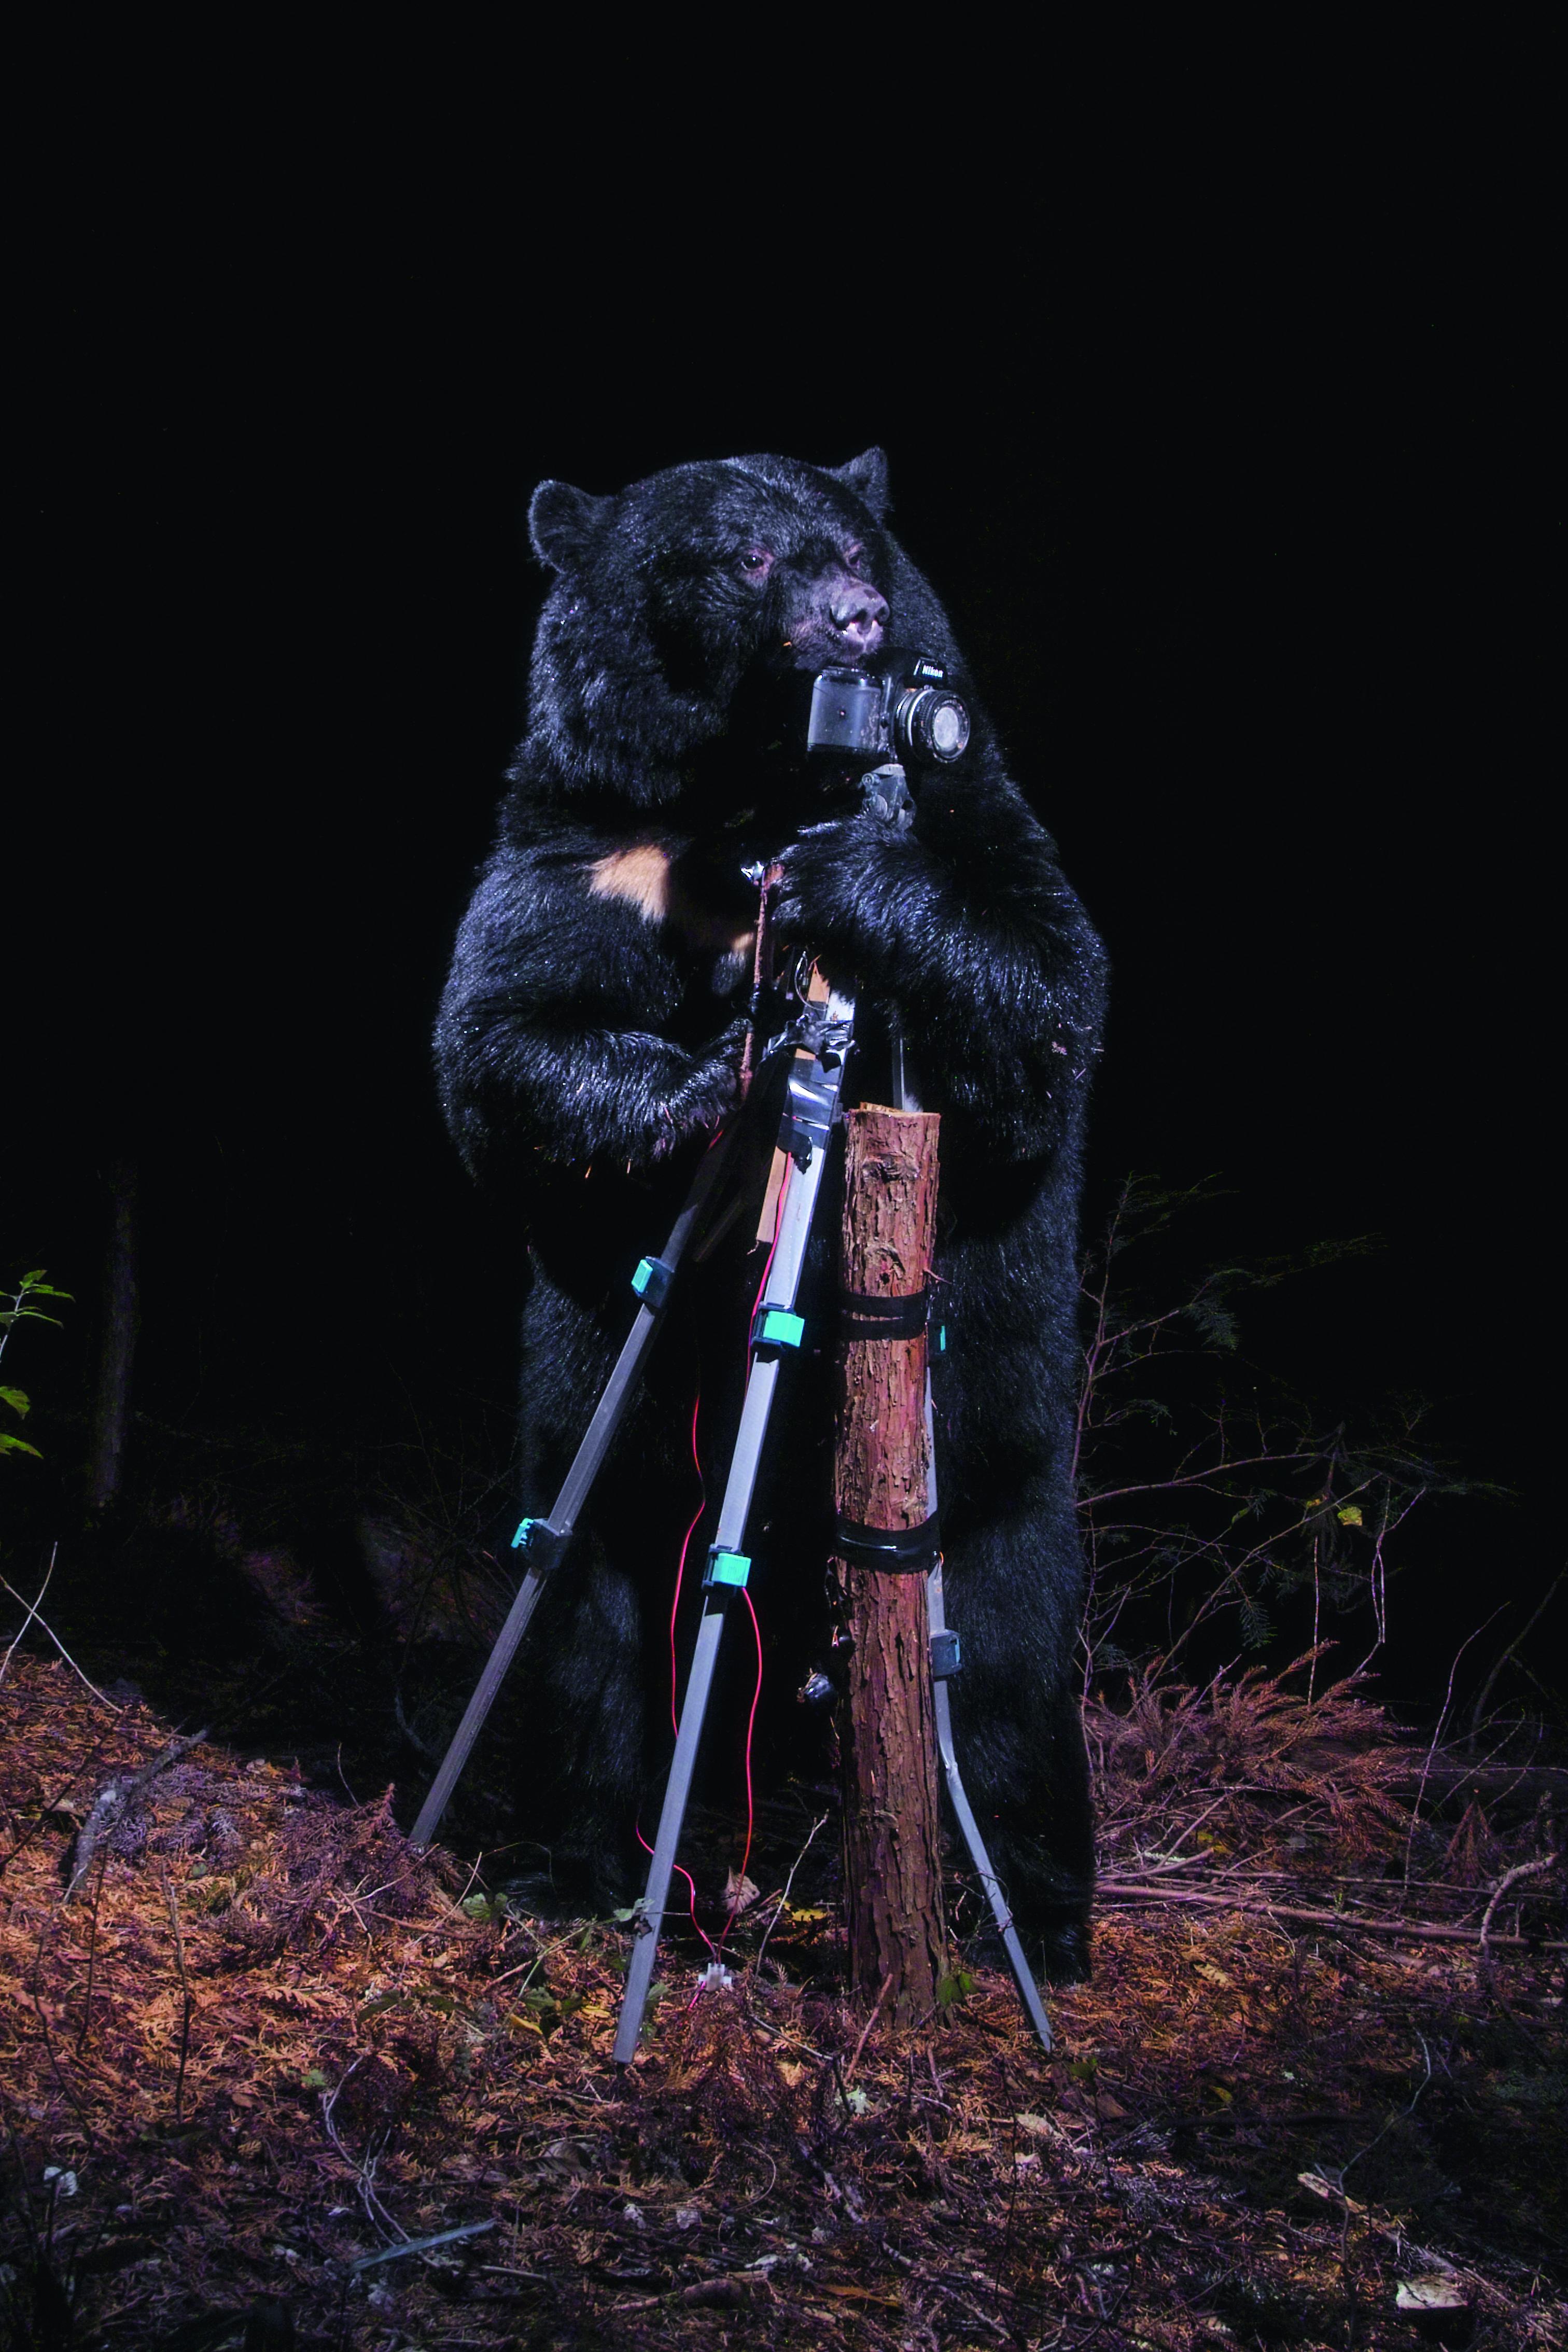 A black bear plays with the Camera, Nagano, 2006 - Crédit photo Manabu Miyazaki